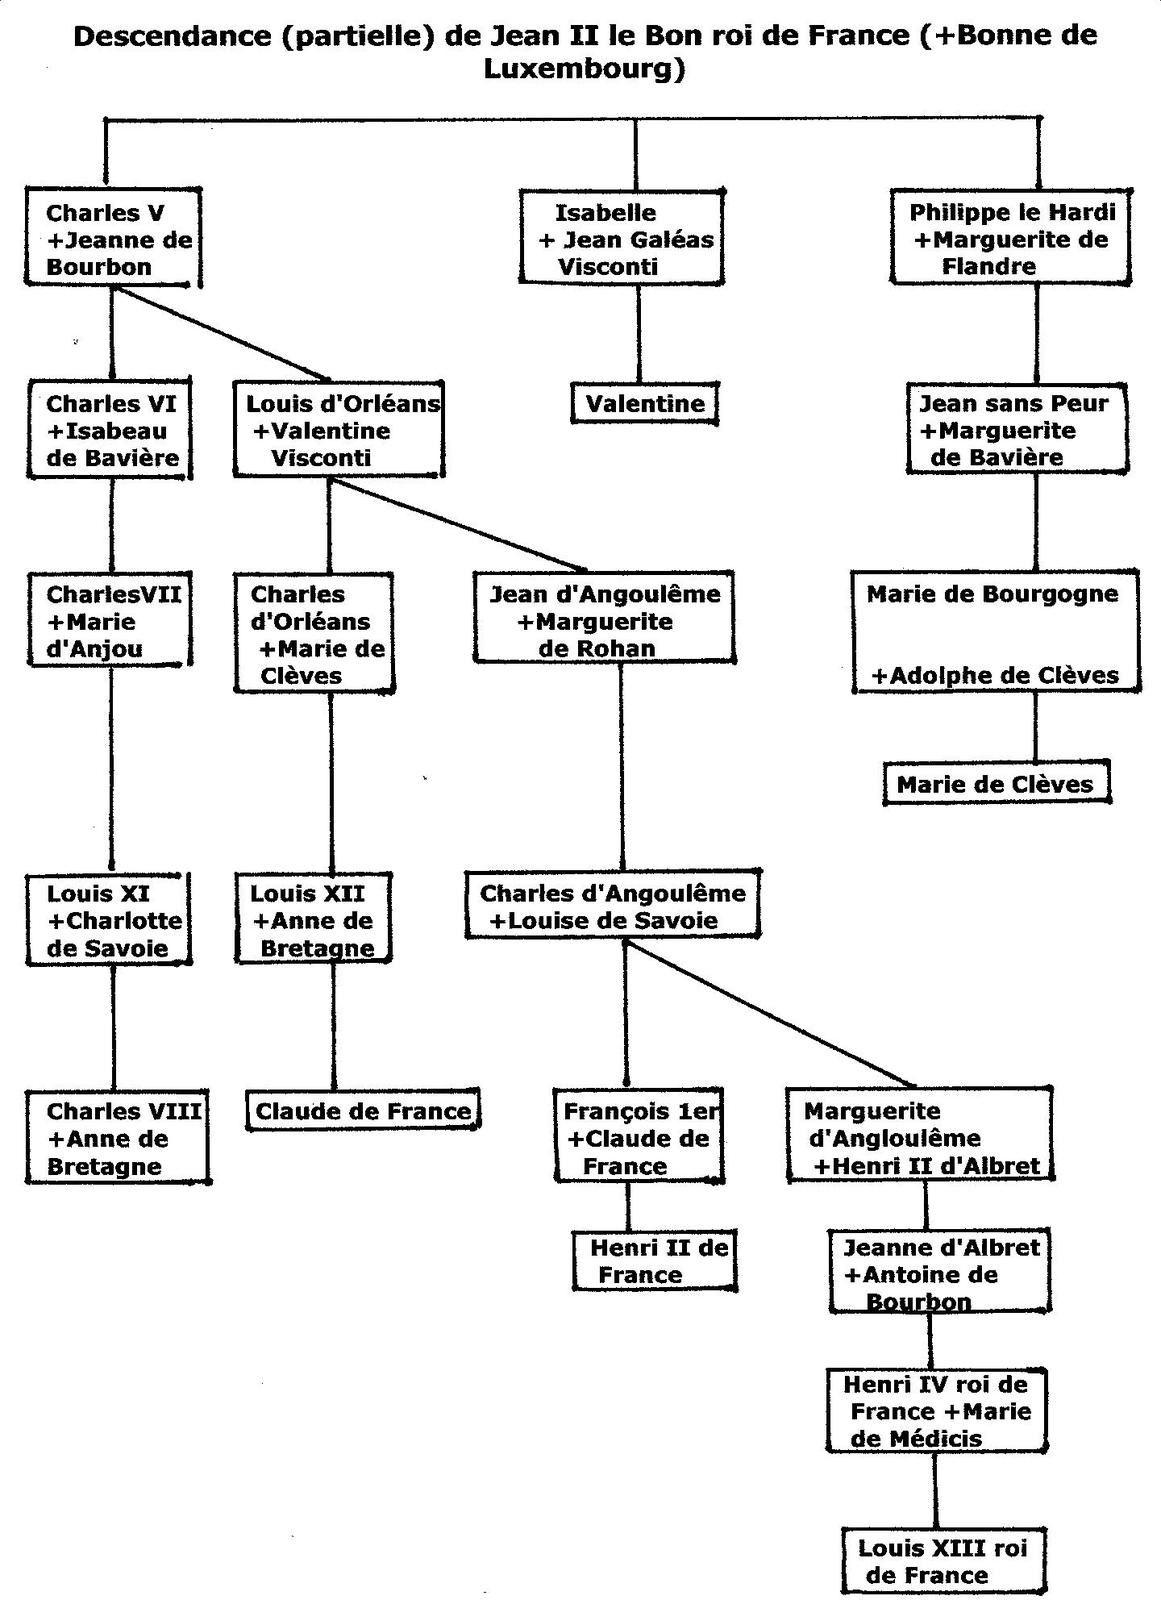 descendance de Jean II le Bon roi de France